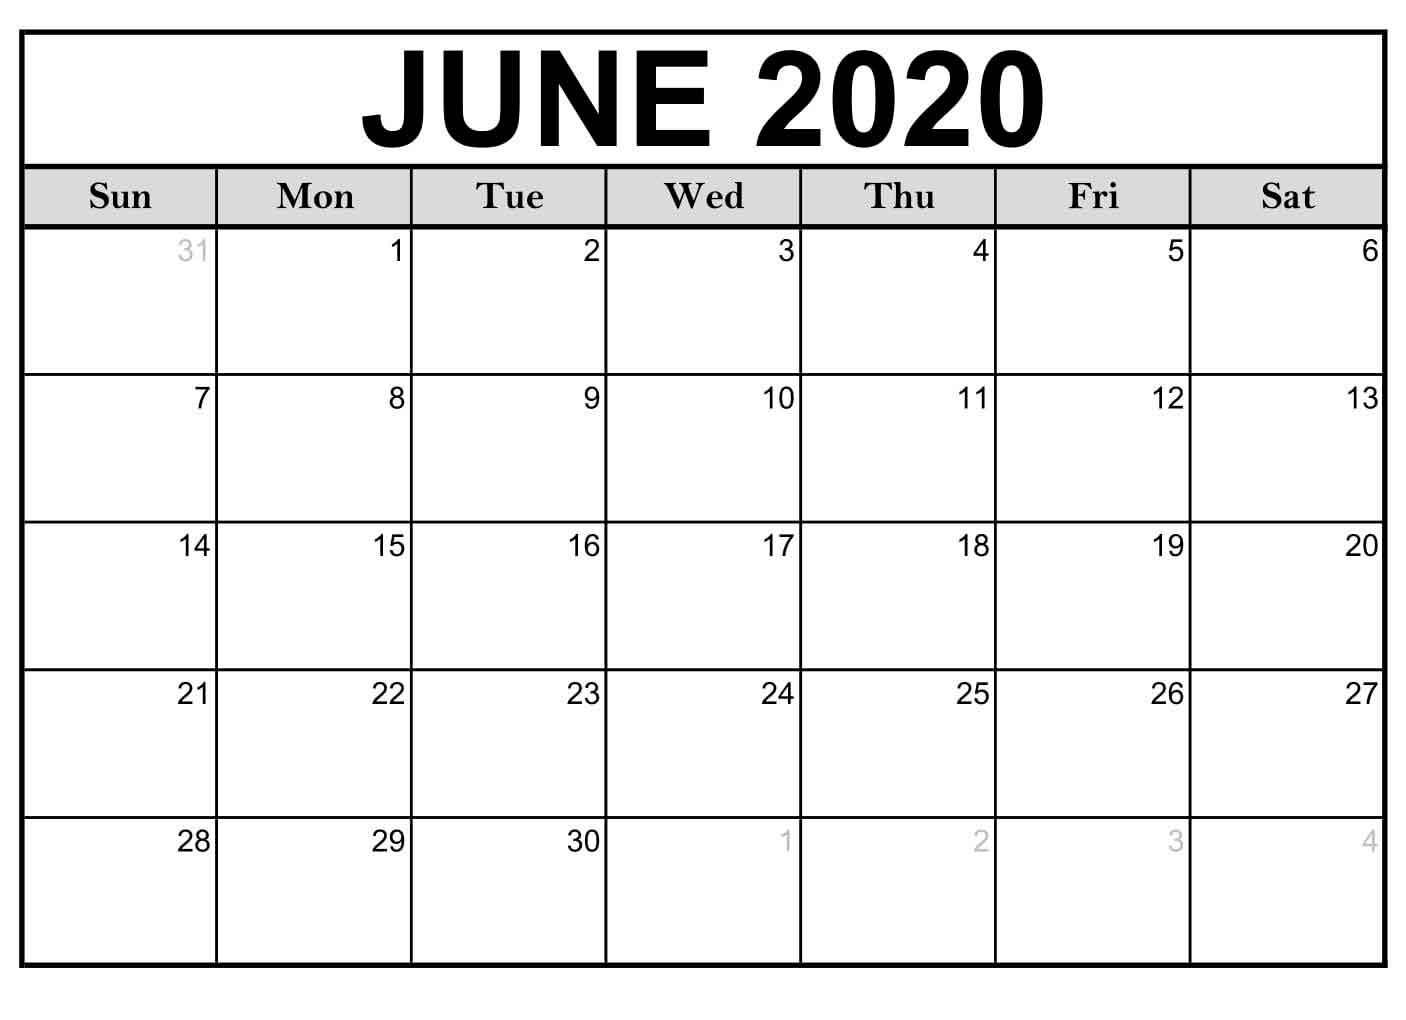 June Blank Calendar 2020 - Free Printable Calendar Templates